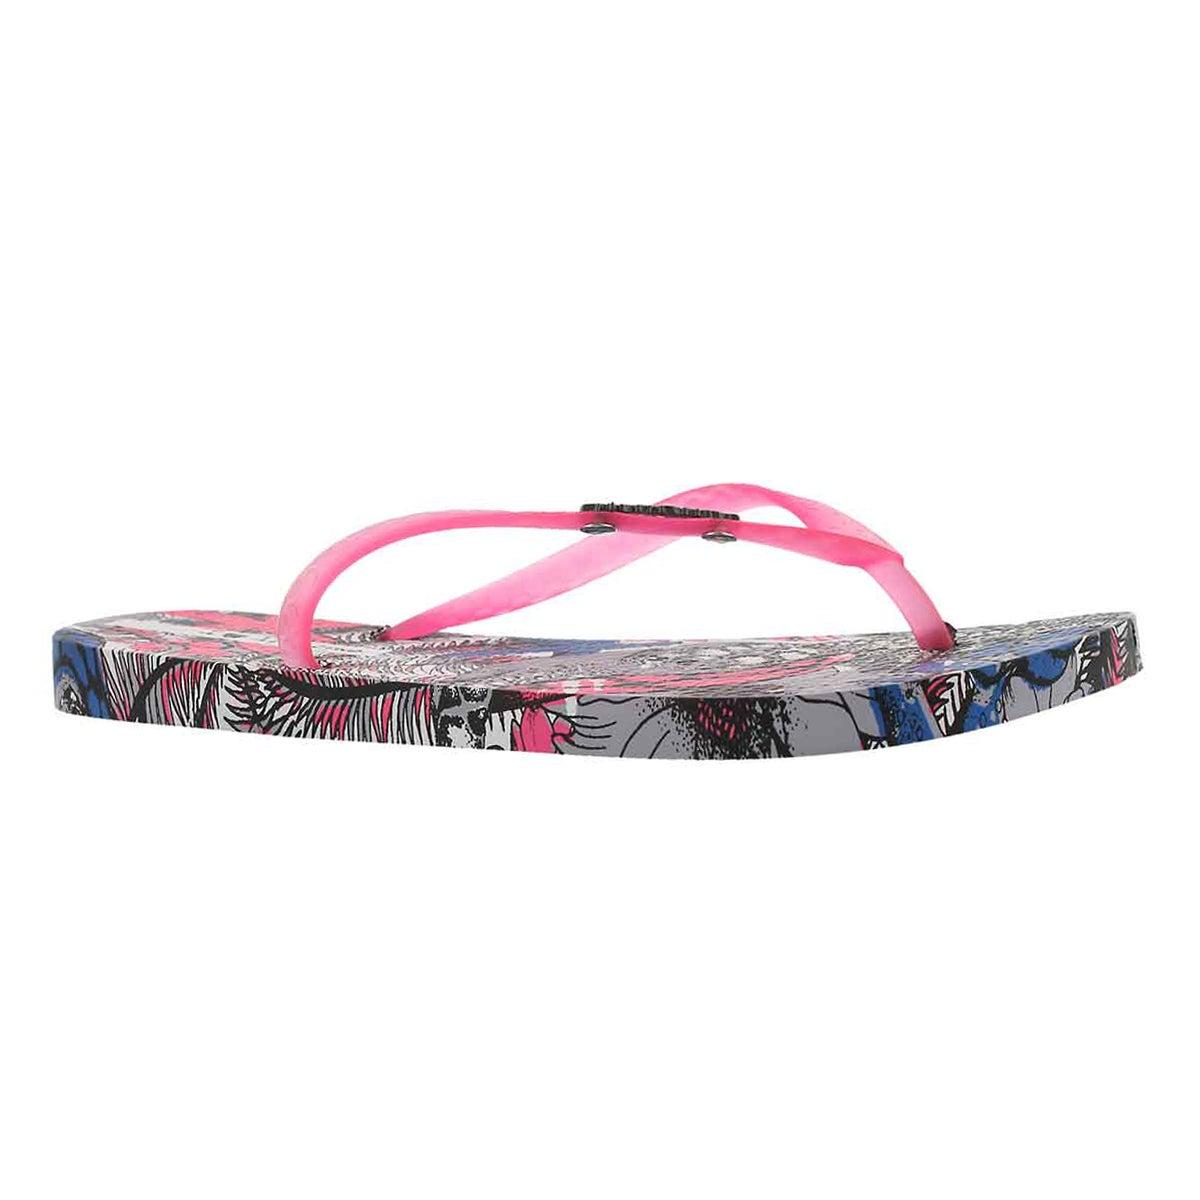 Lds Tropical Beauty gry/pink flip flop